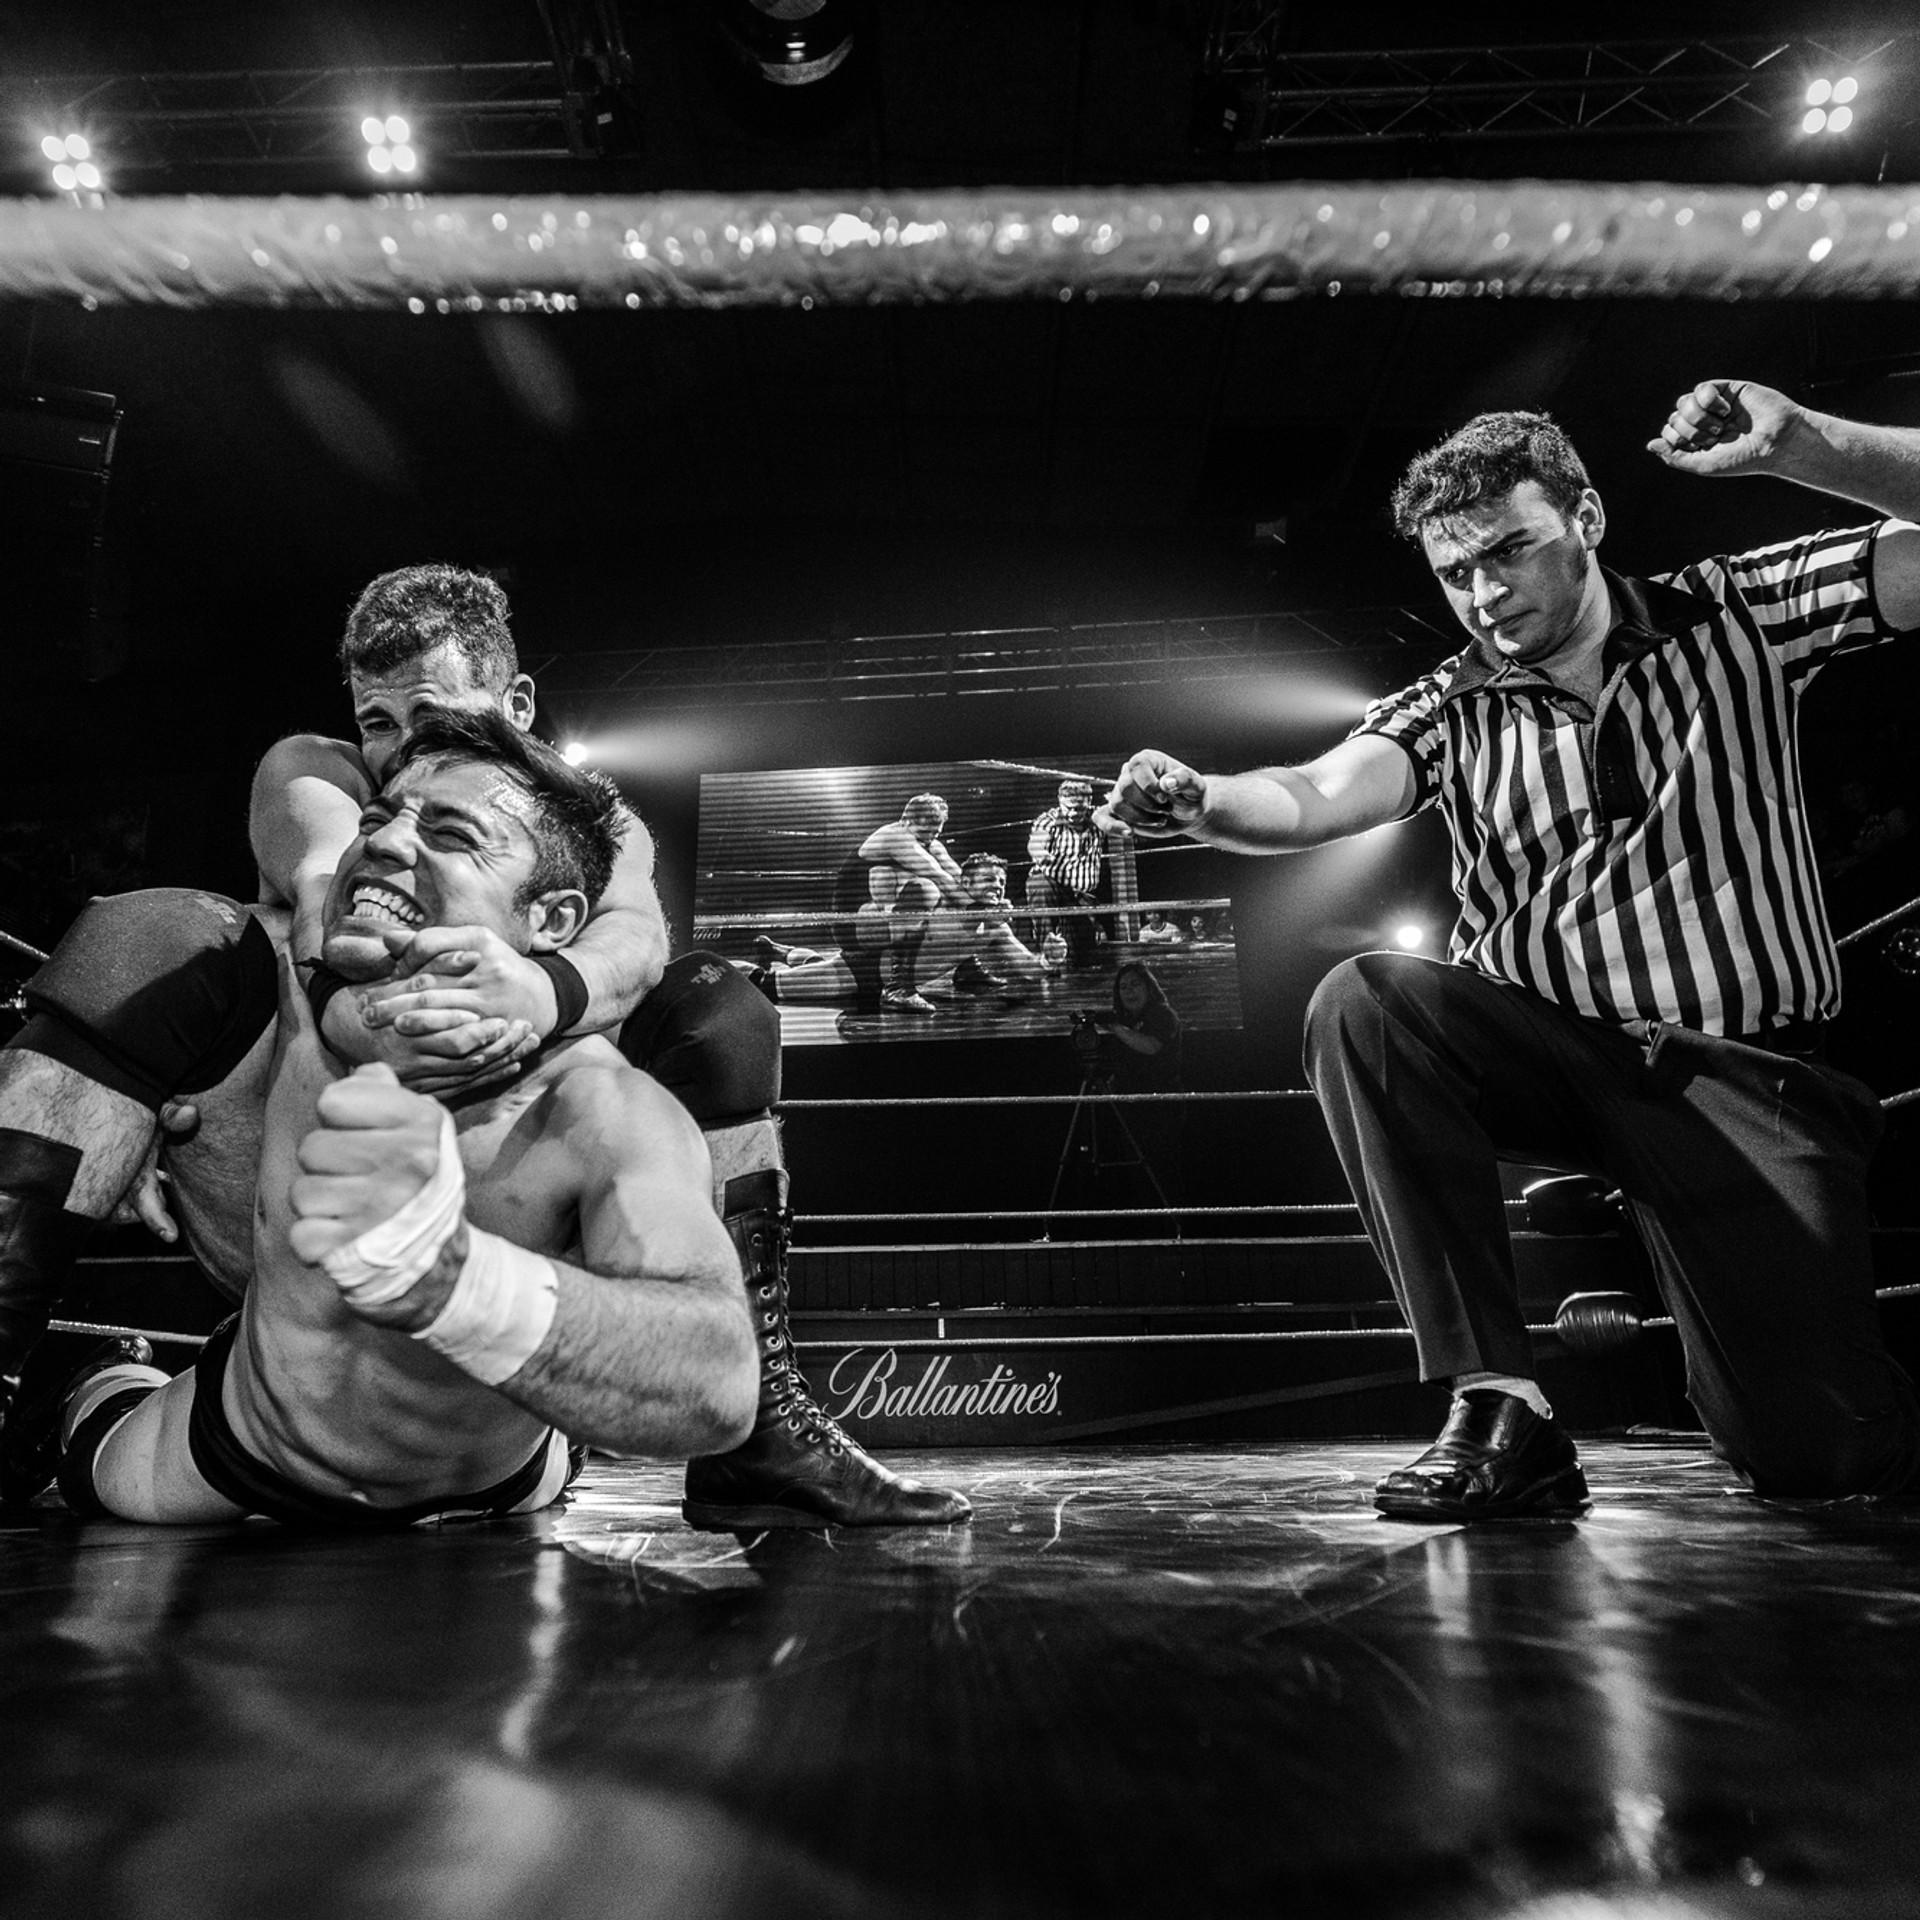 CNL Ring Side -  Pro Wrestling Photography - Fotografía de Lucha Libre